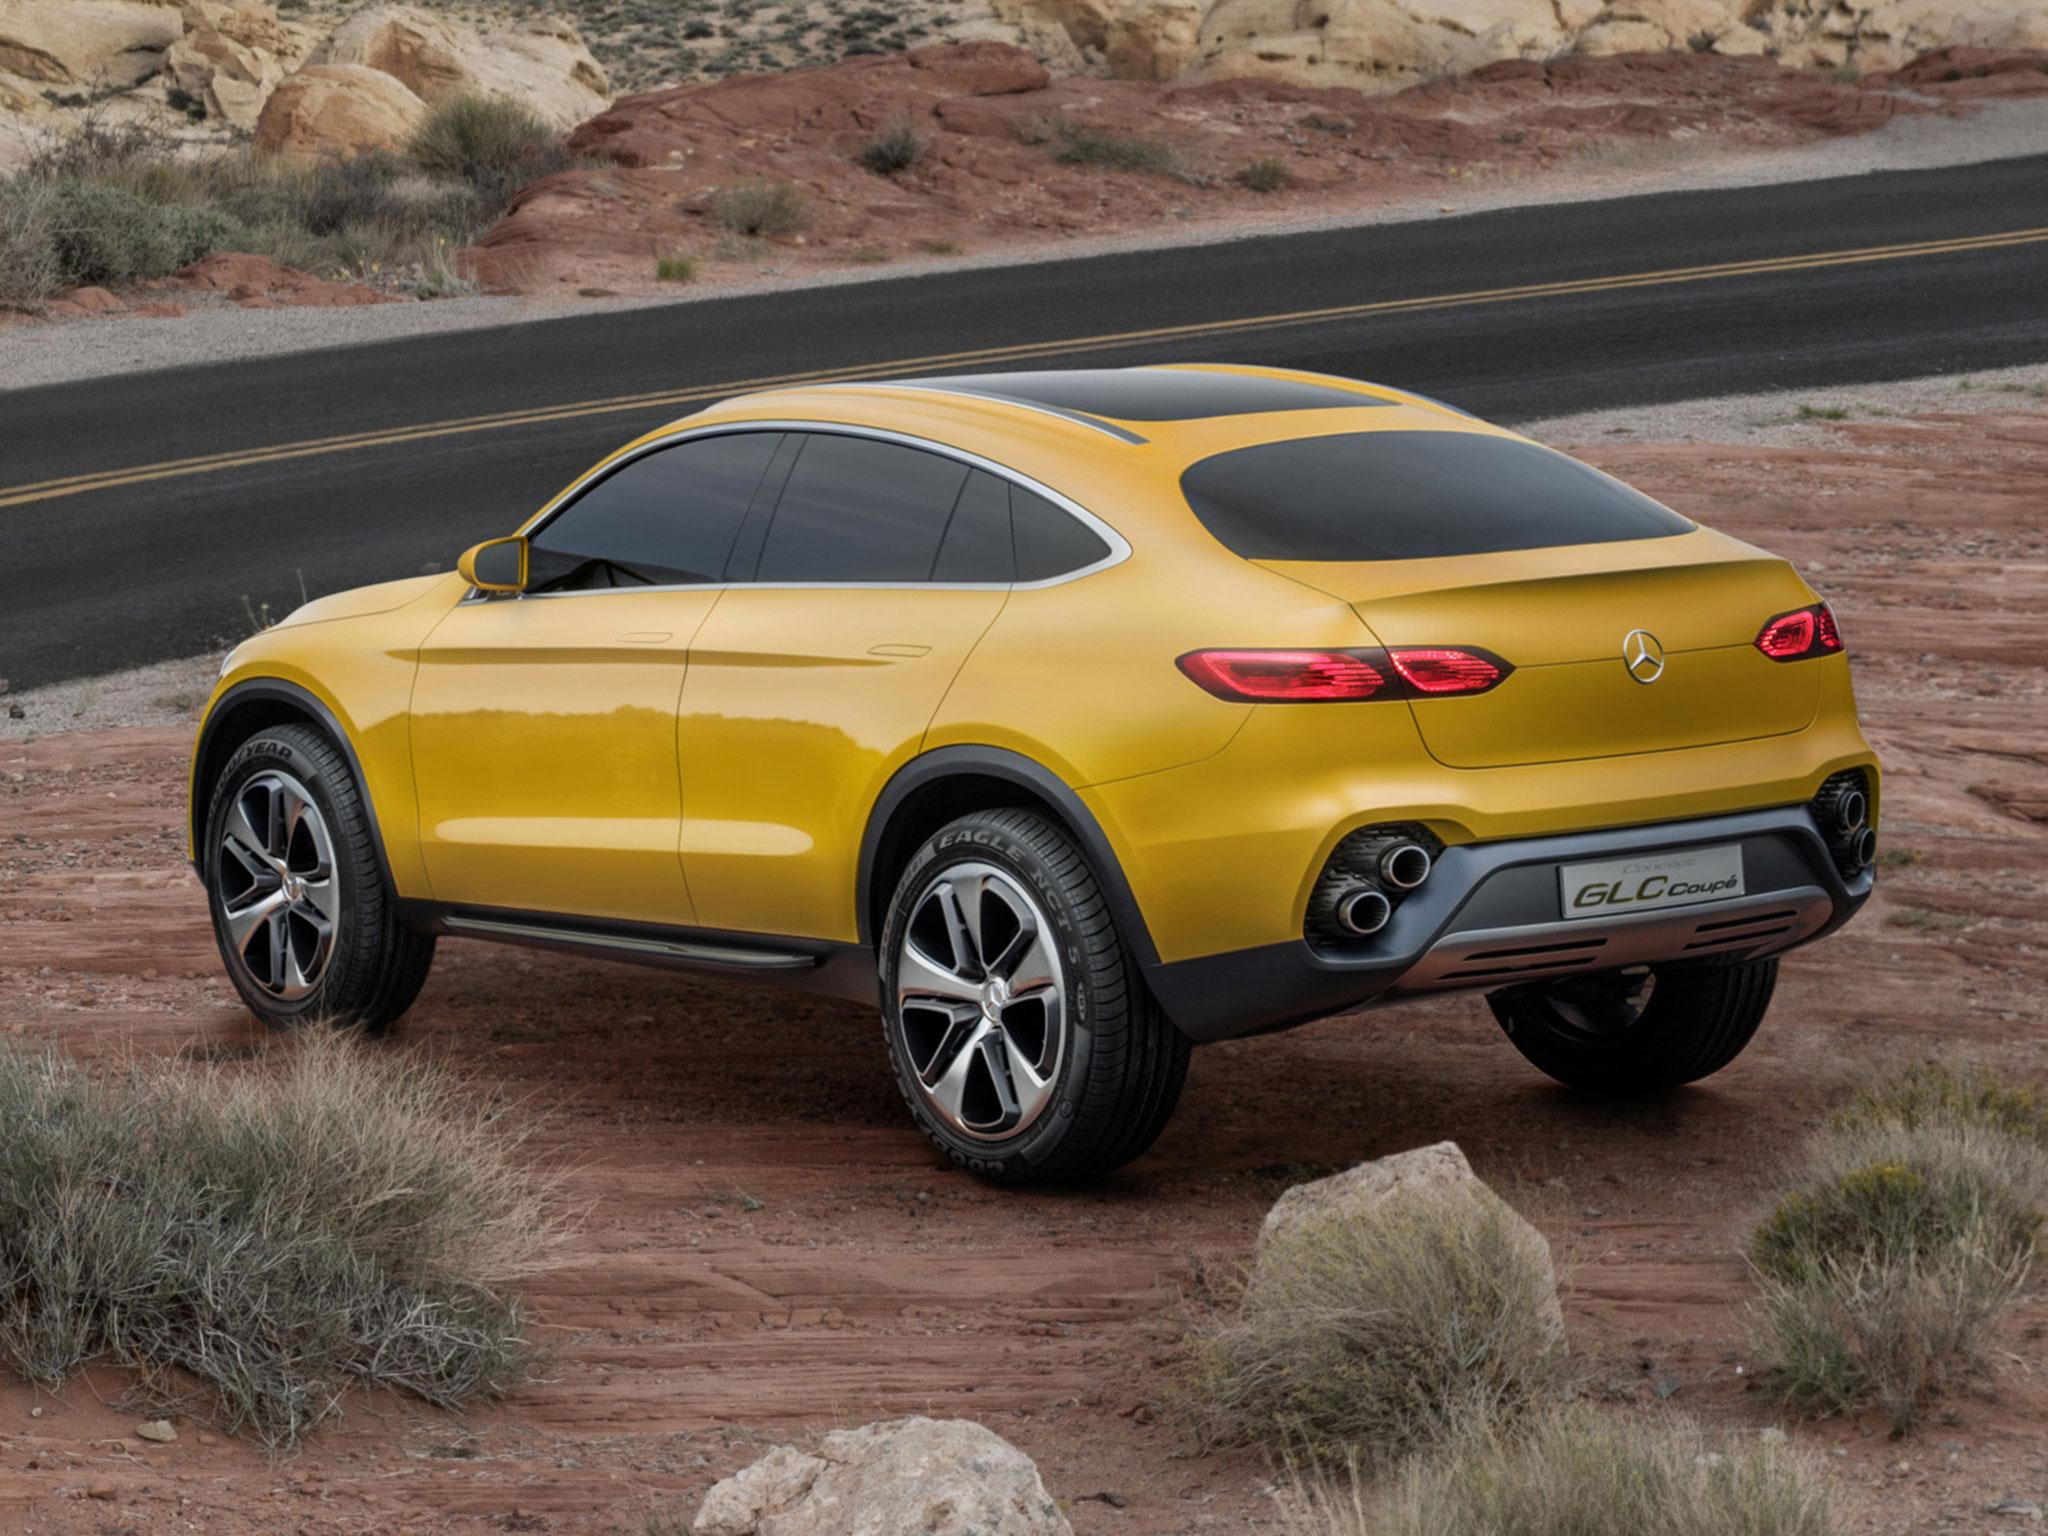 Glc Class Coupe Future Vehicle Mercedes Benz